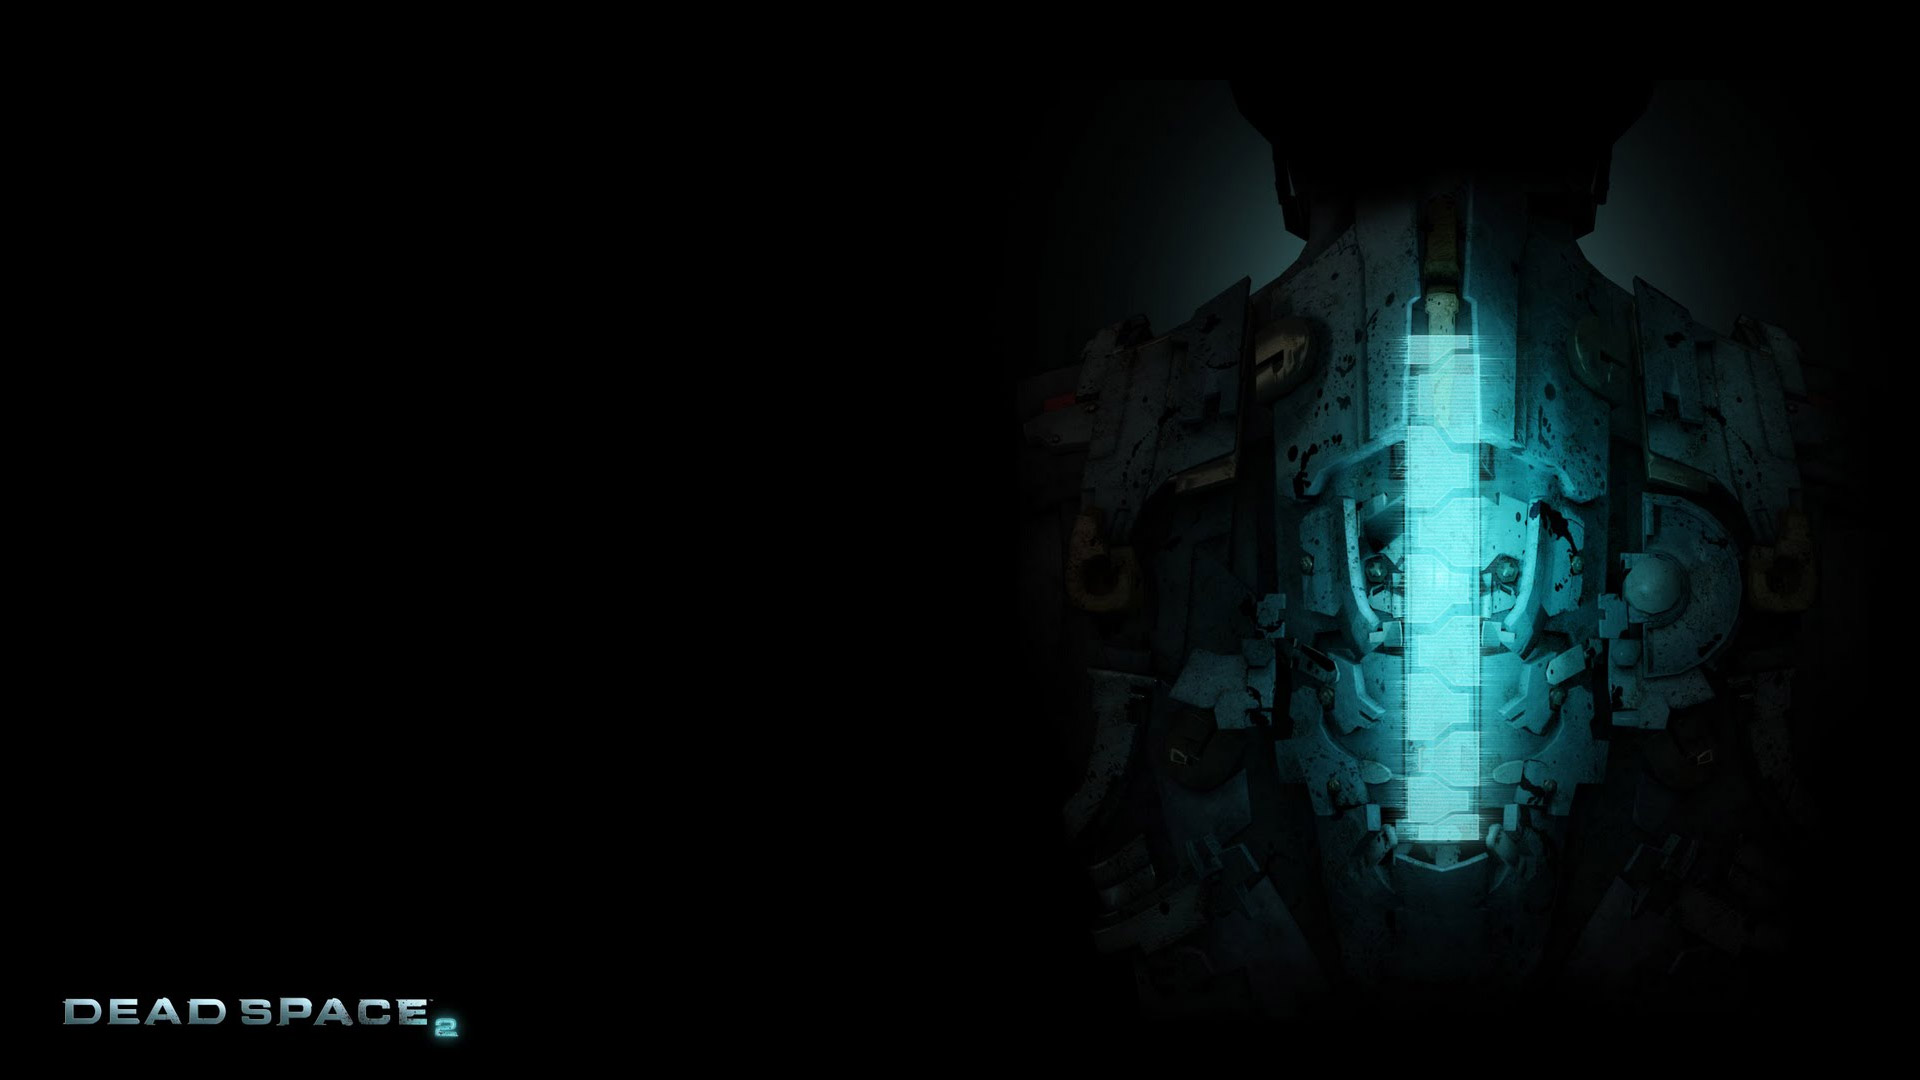 Dead Space 2 Wallpapers in HD